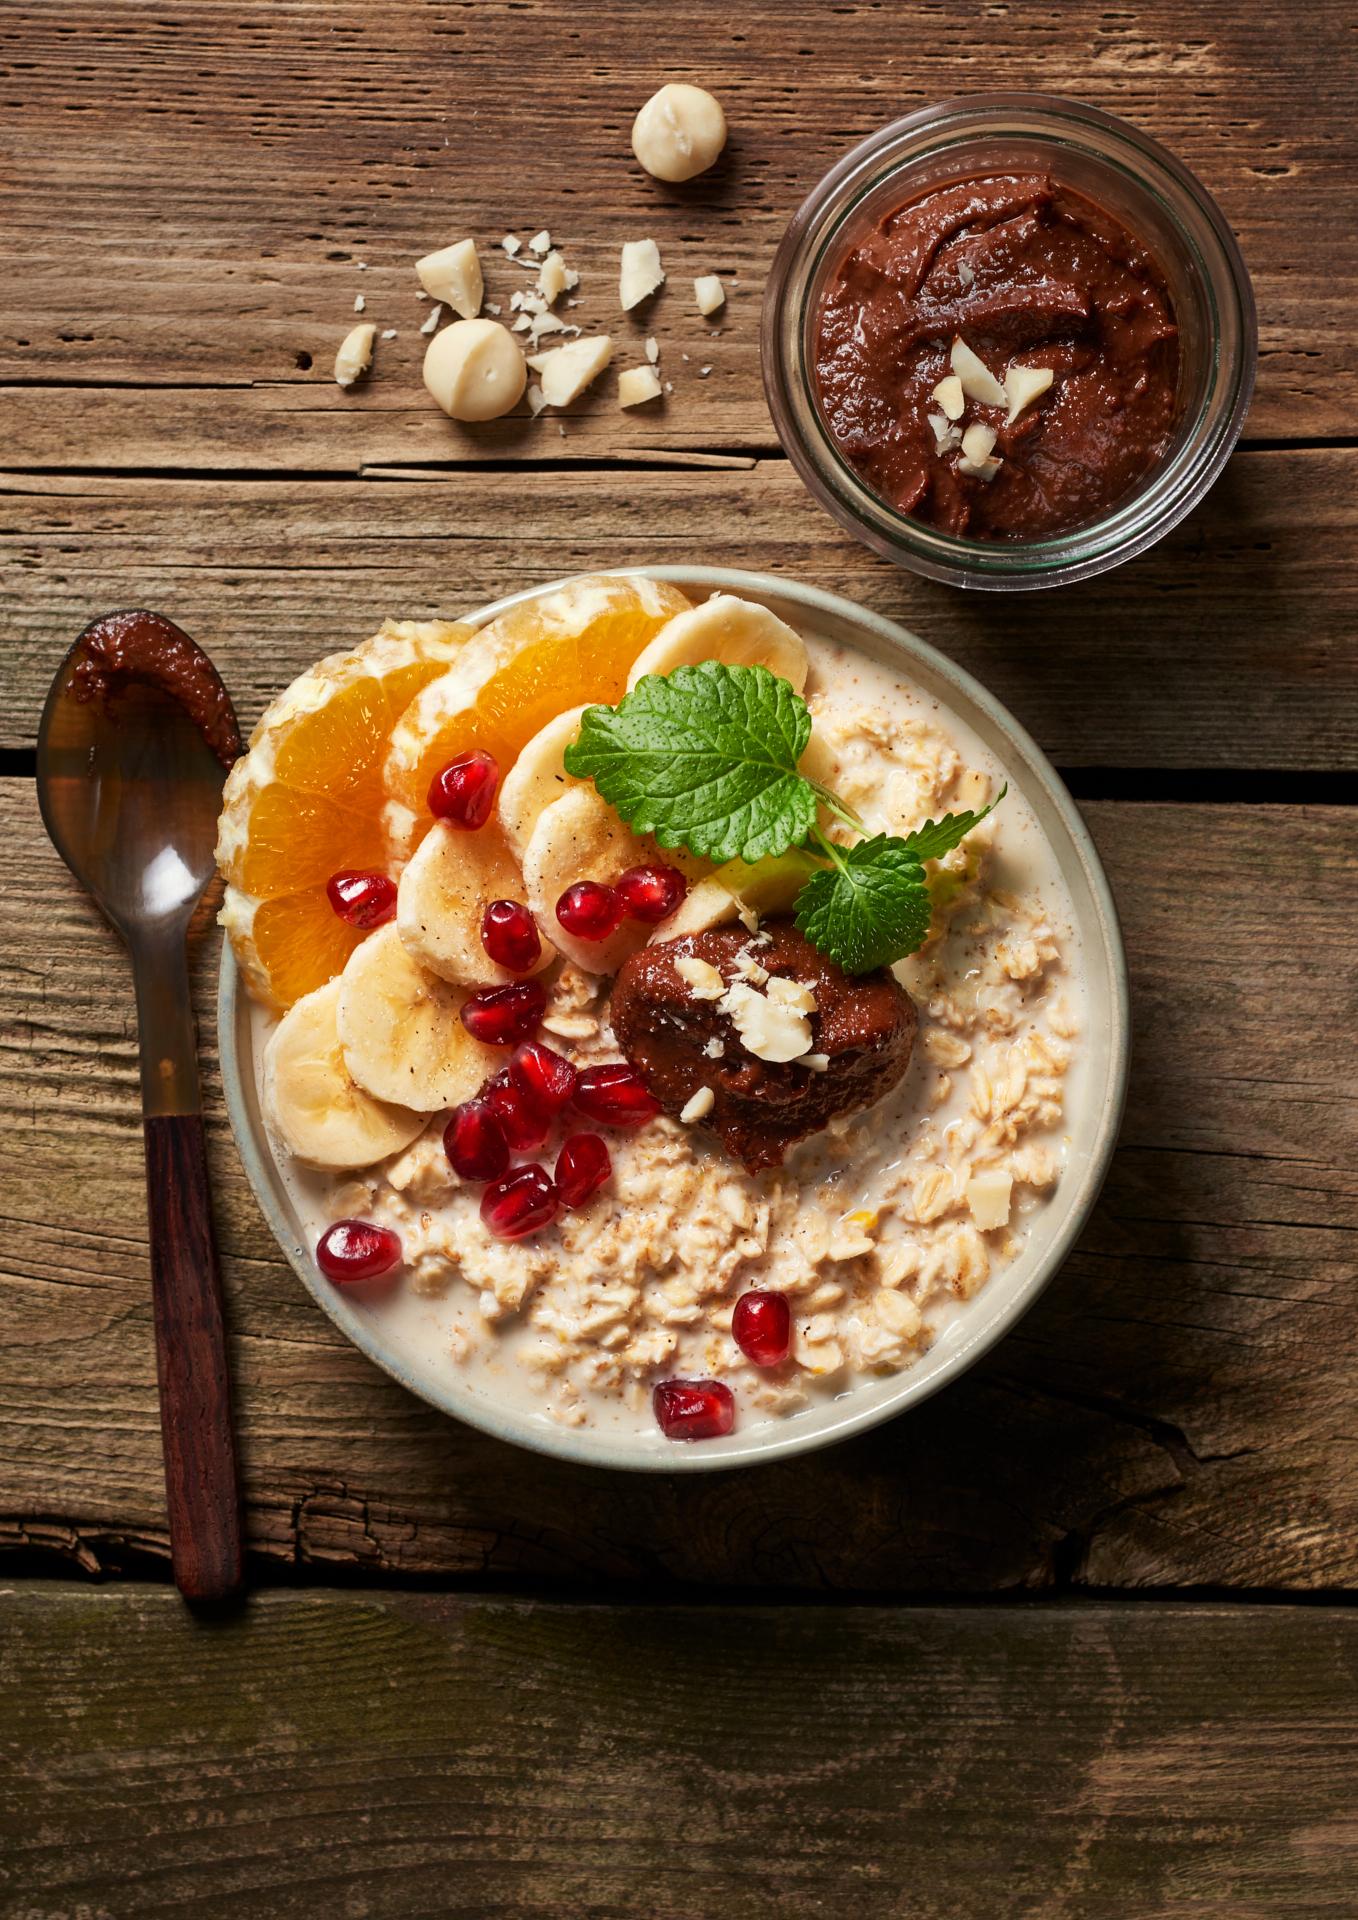 macadamia-creme-vegan-gesunde-fette-overnight-oats-fruechte-haferflocken